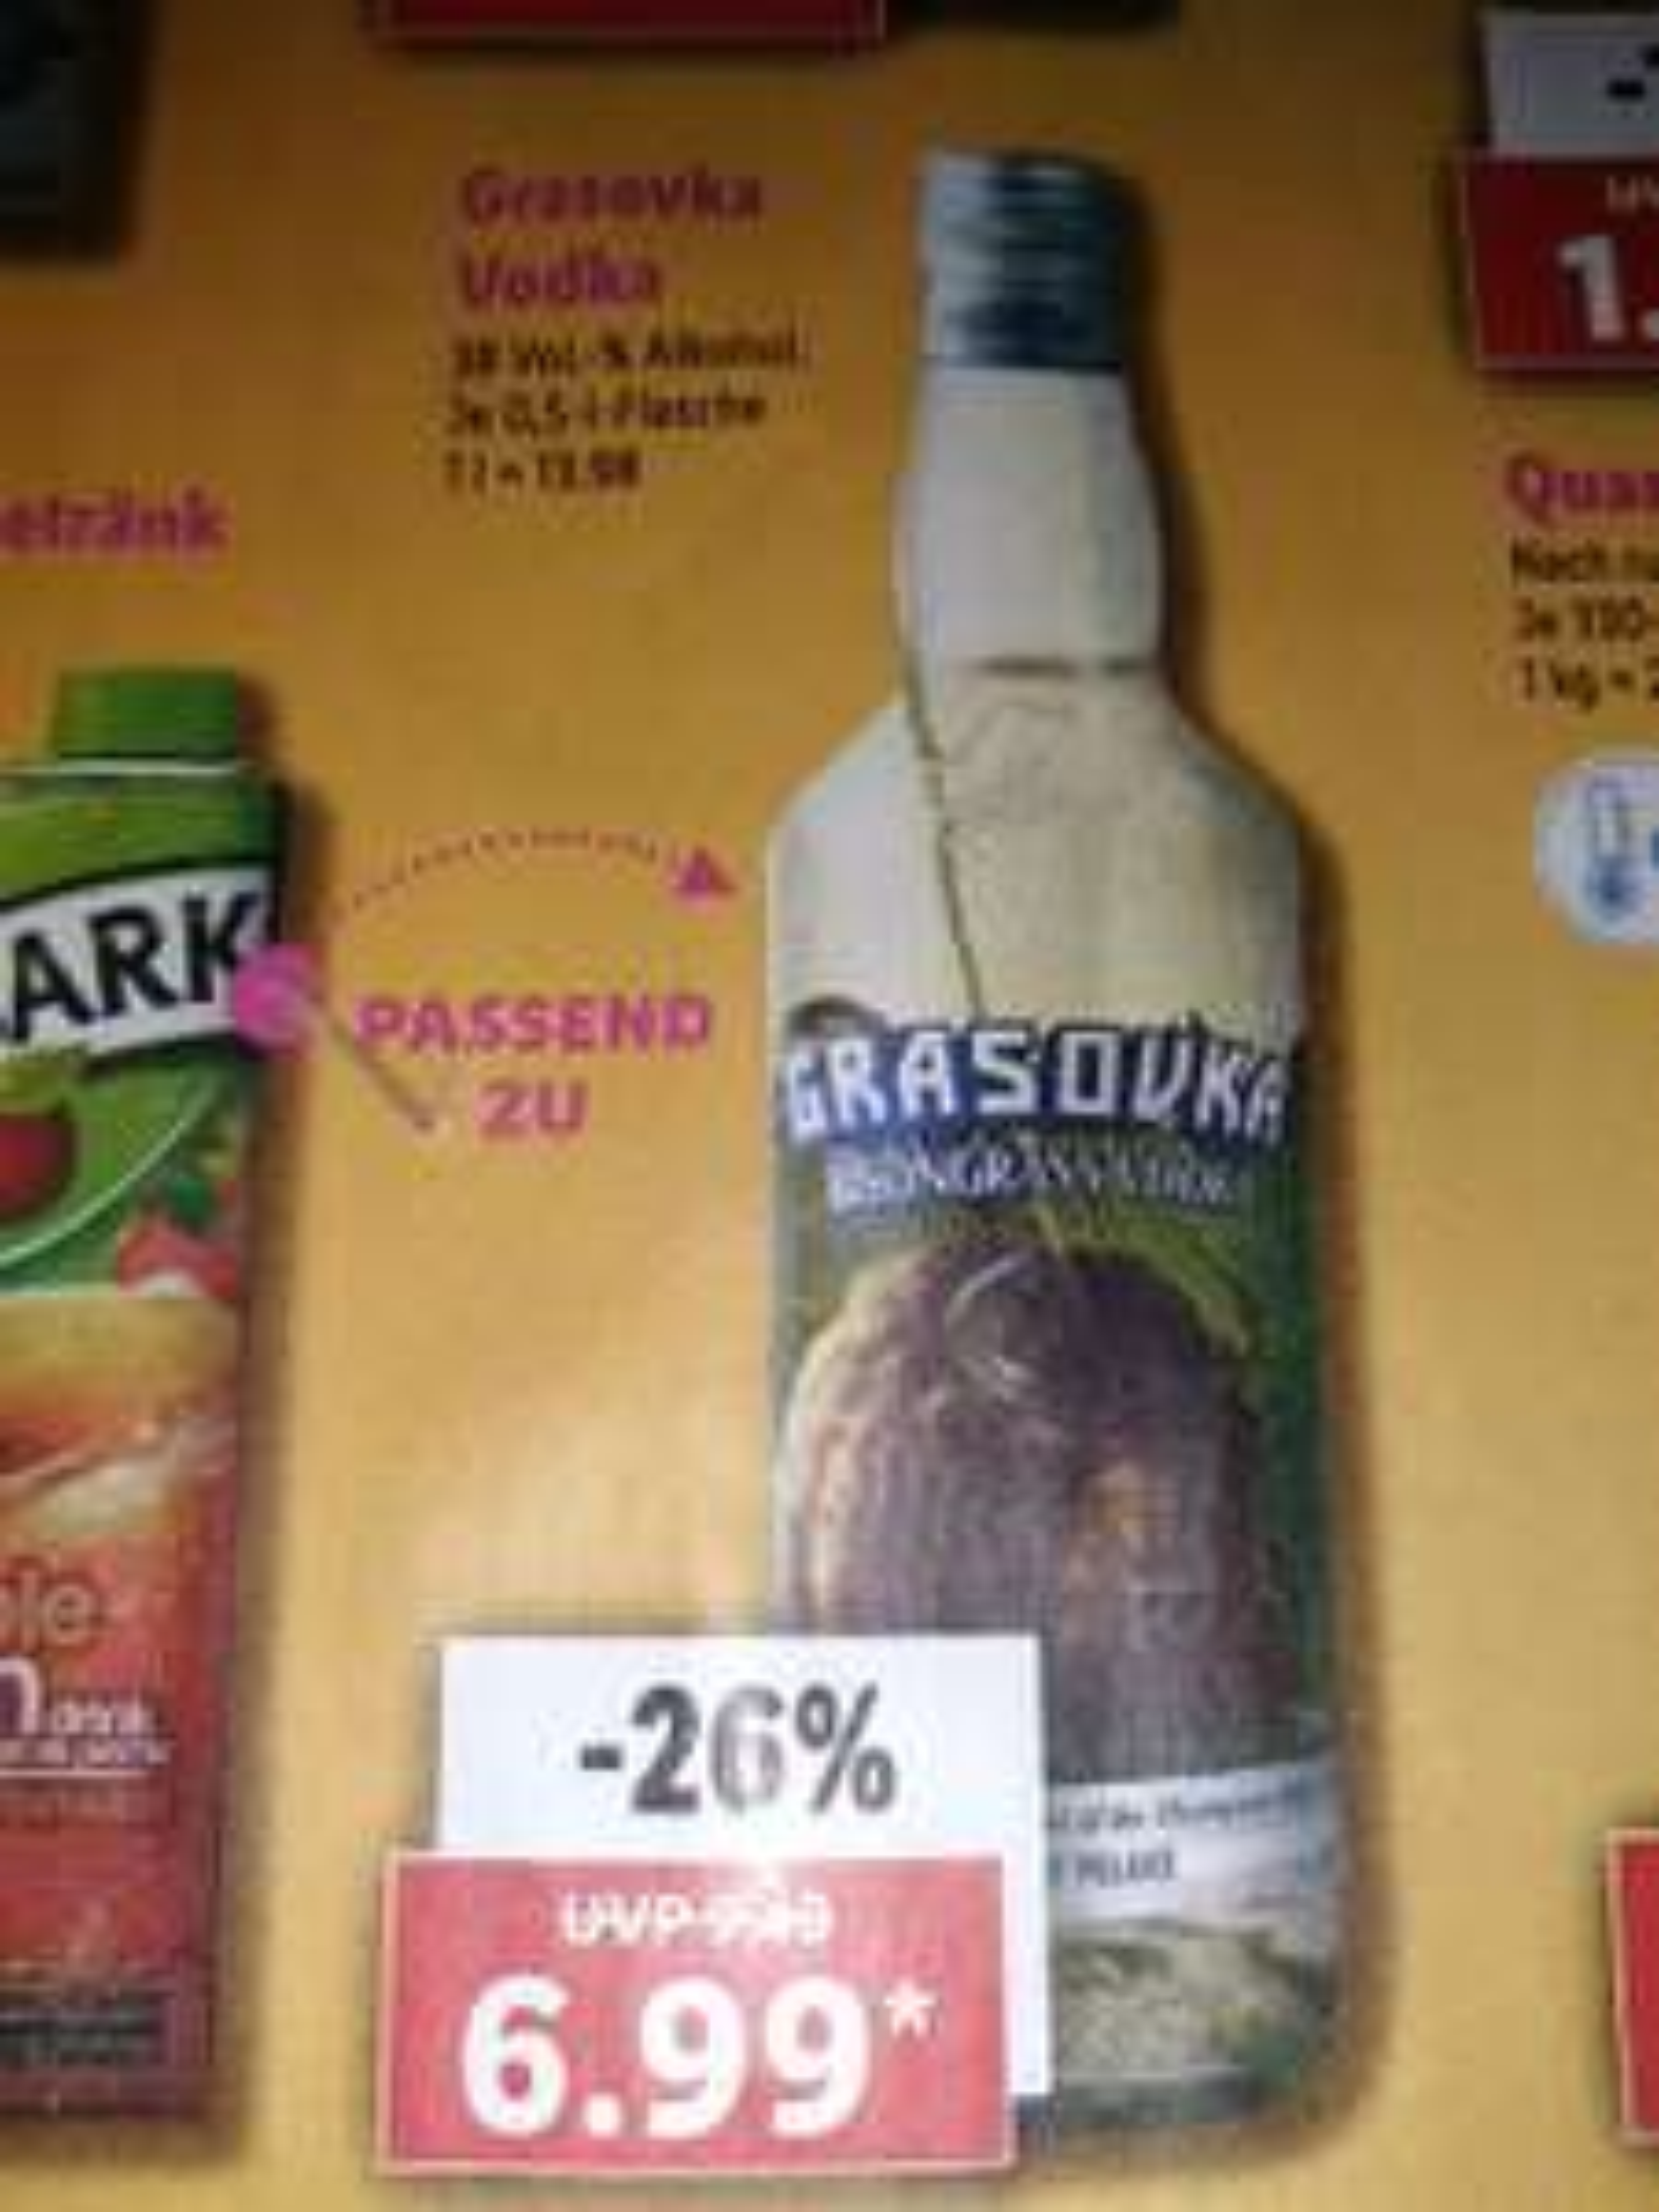 Grasovka Vodka 38% 0,5Liter bei Lidl in der